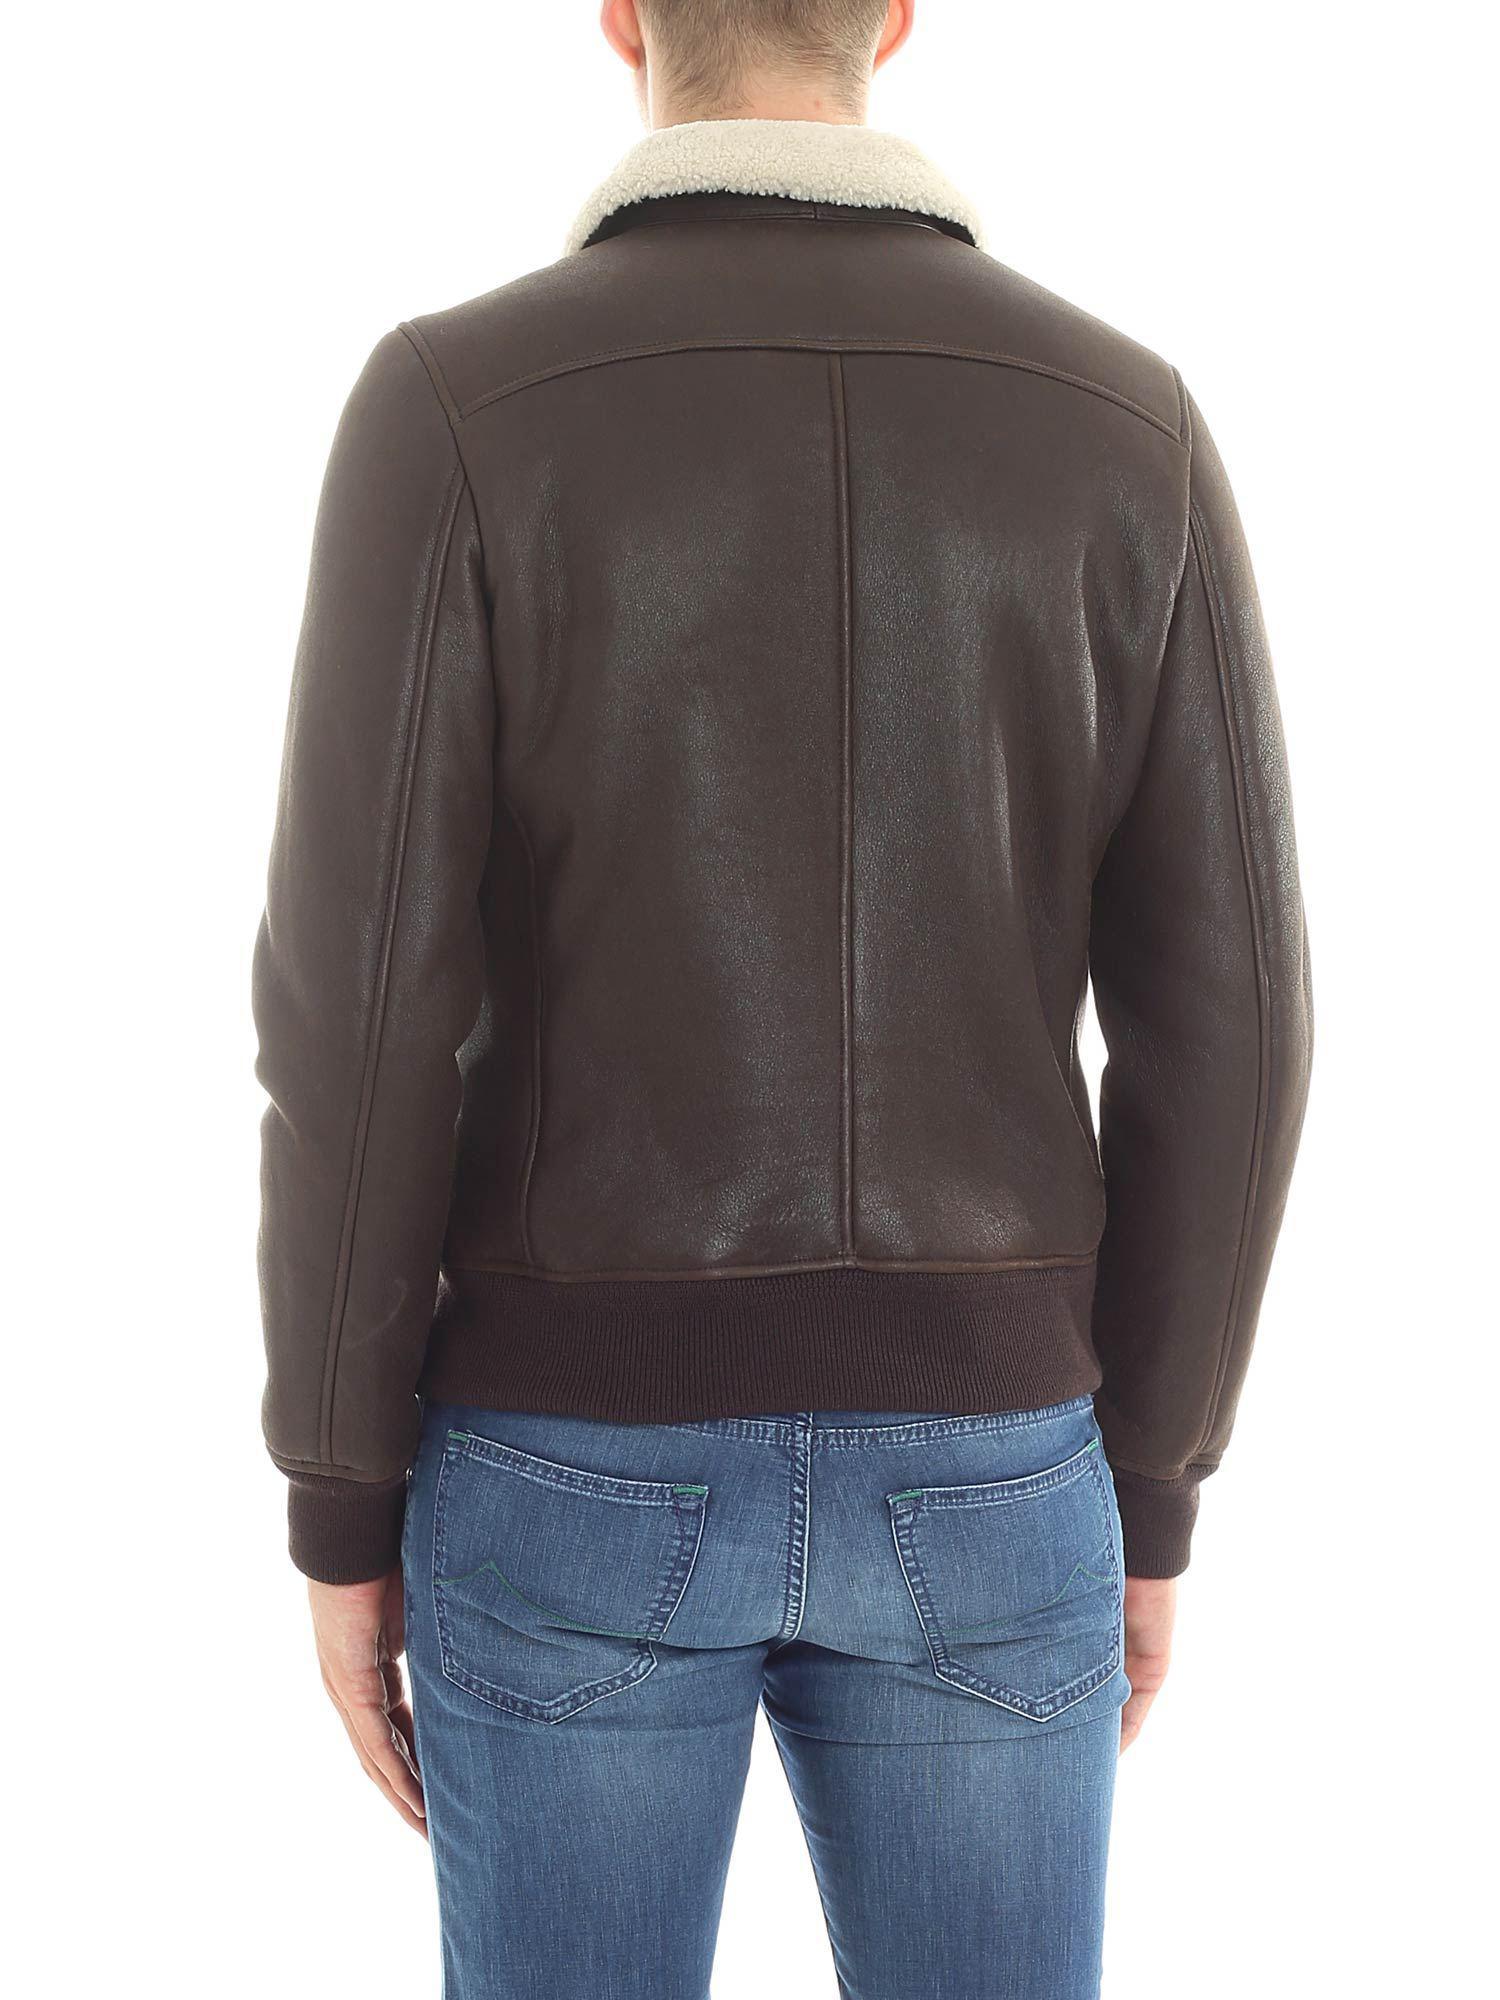 Stewart Brown Nubuck Leather Jacket for Men